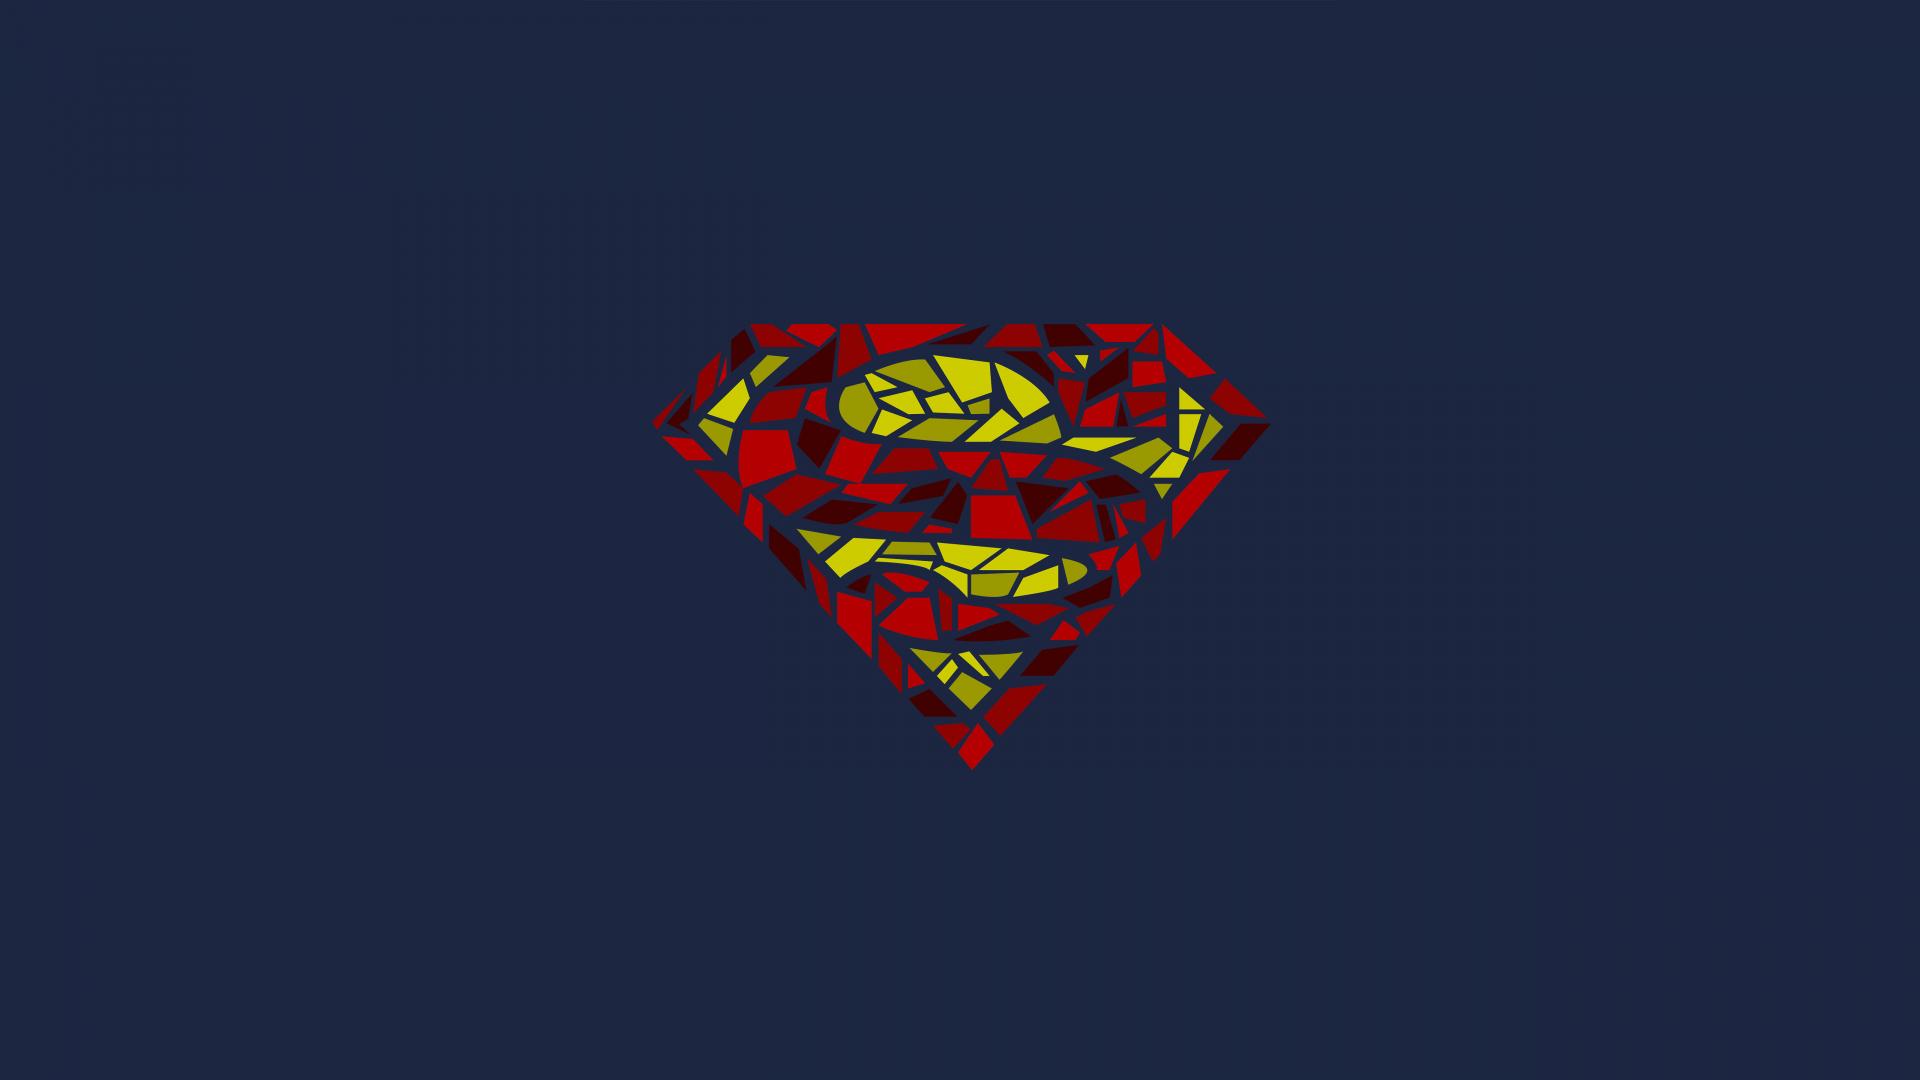 Download 1920x1080 wallpaper superman logo mosaic artwork superman logo mosaic artwork superhero minimal 1920x1080 wallpaper voltagebd Choice Image